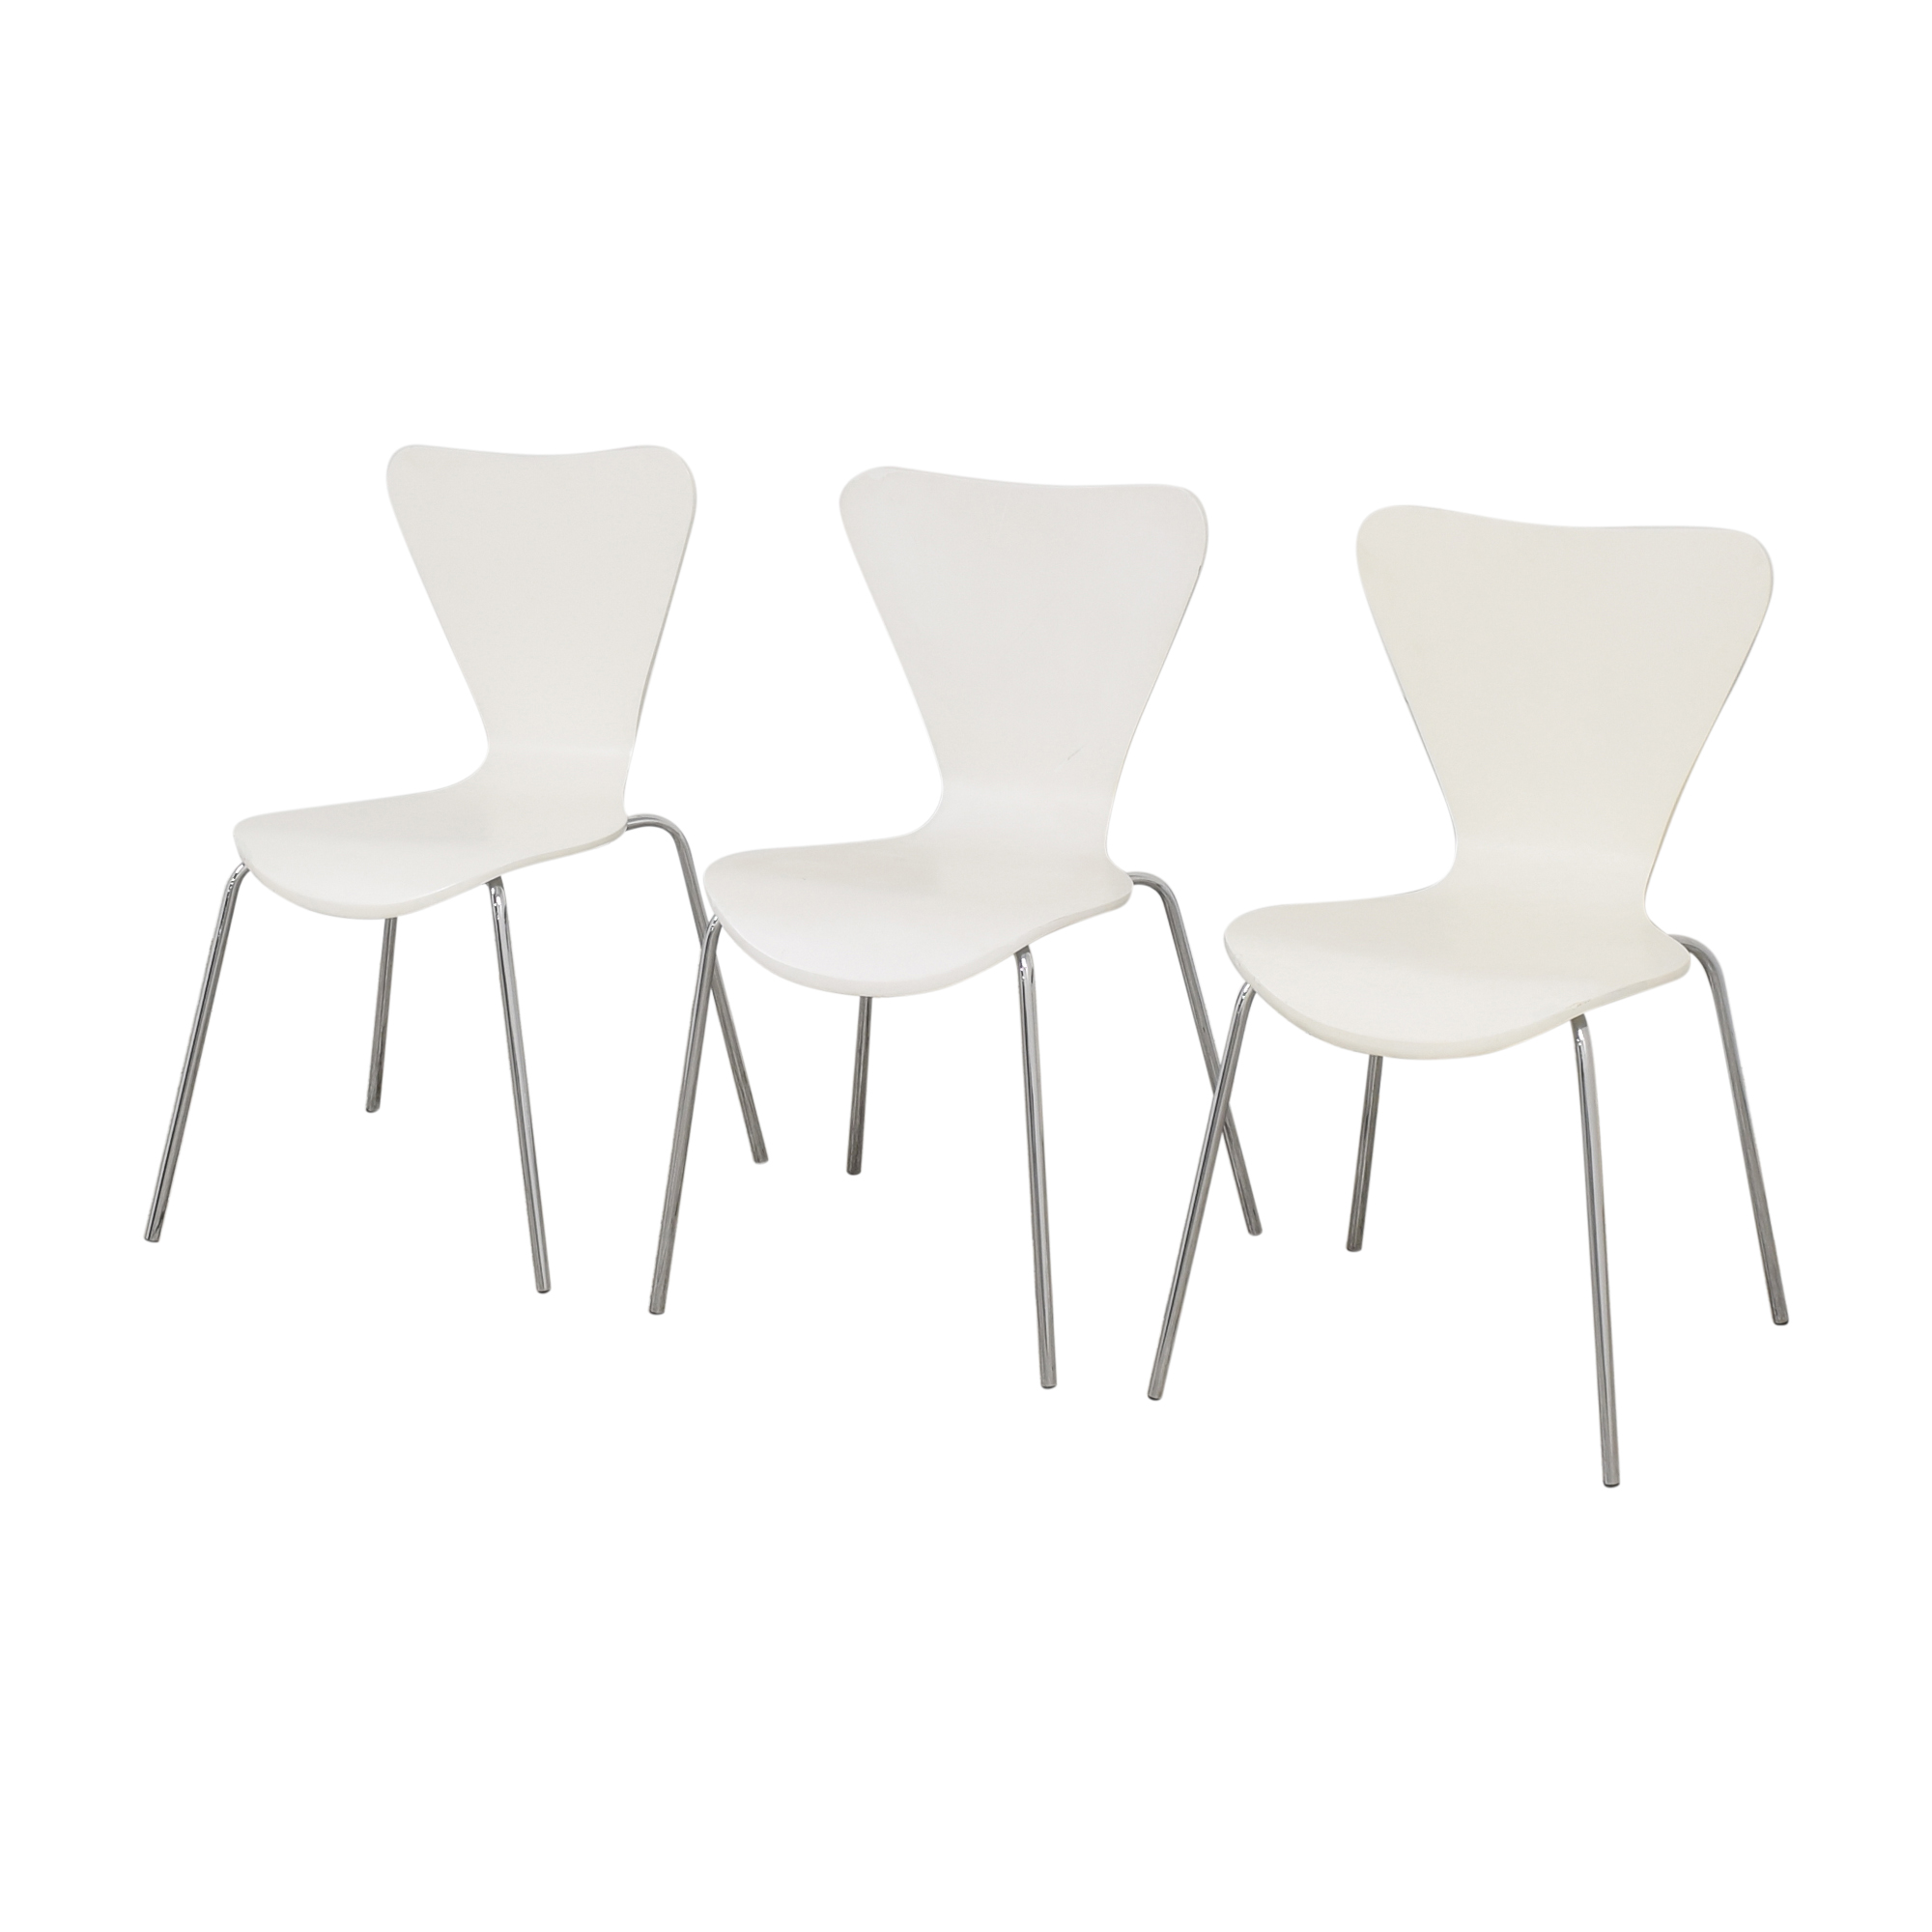 Room & Board Room & Board Jake Dining Chairs ma